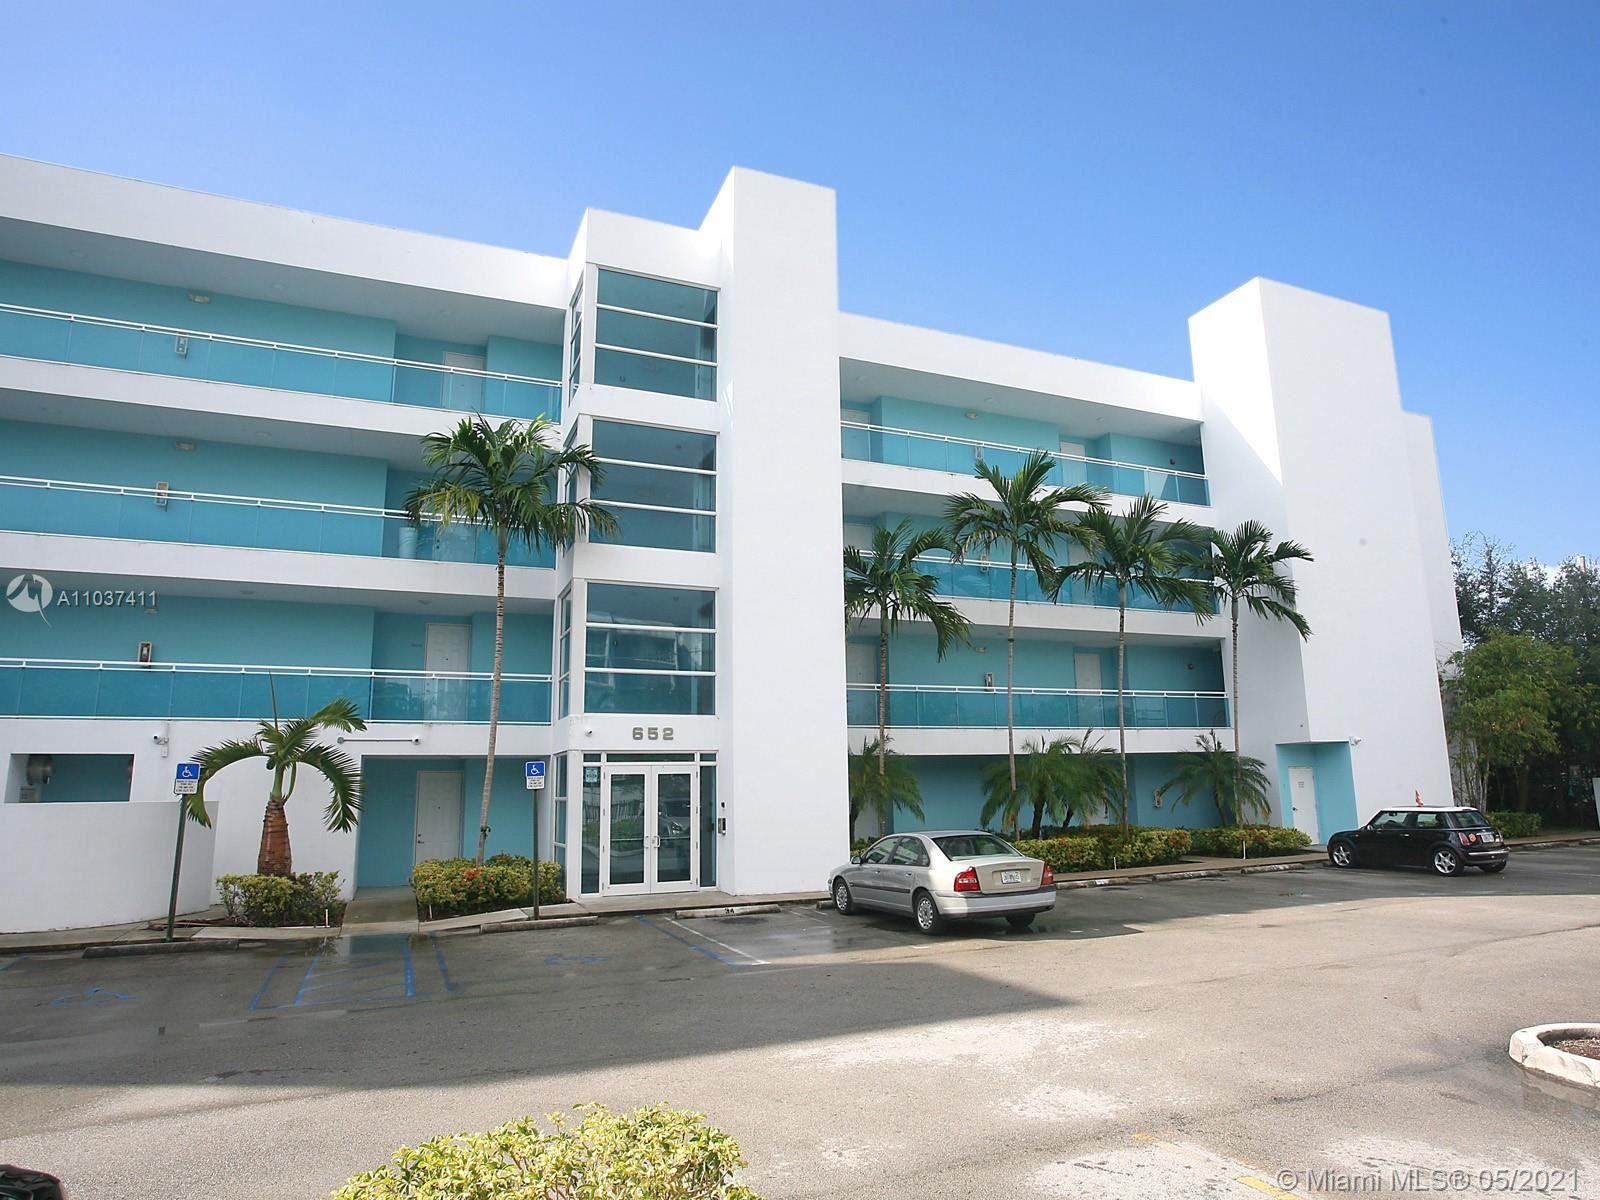 652 NE 63rd St #303, Miami, FL 33138 - #: A11037411